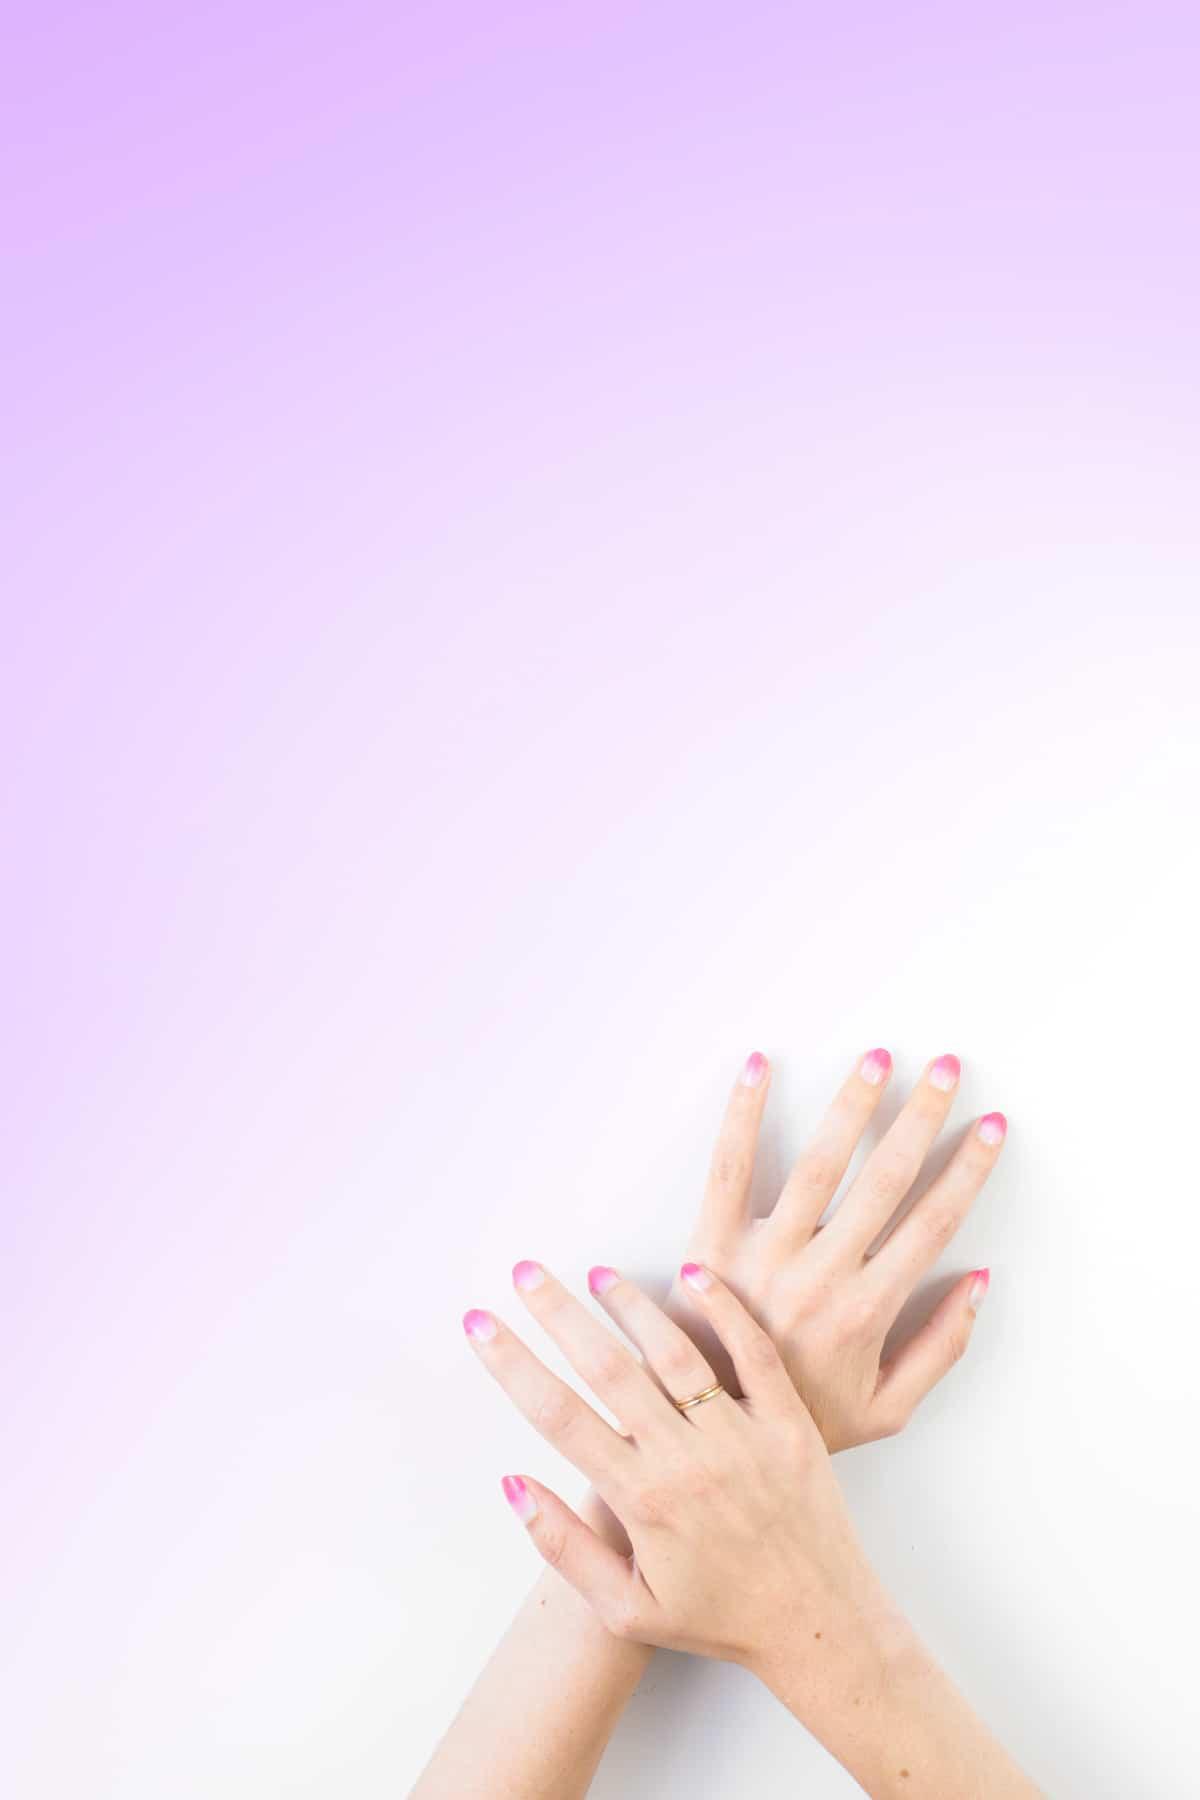 Makeup Sponge Nails by Studio DIY   6 Easy Nail Ideas